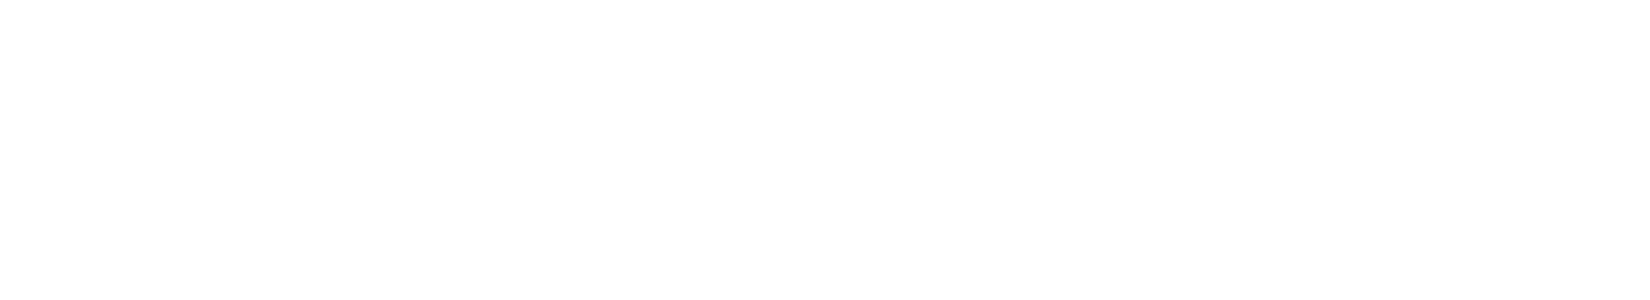 Brantford Brant NDP Logo